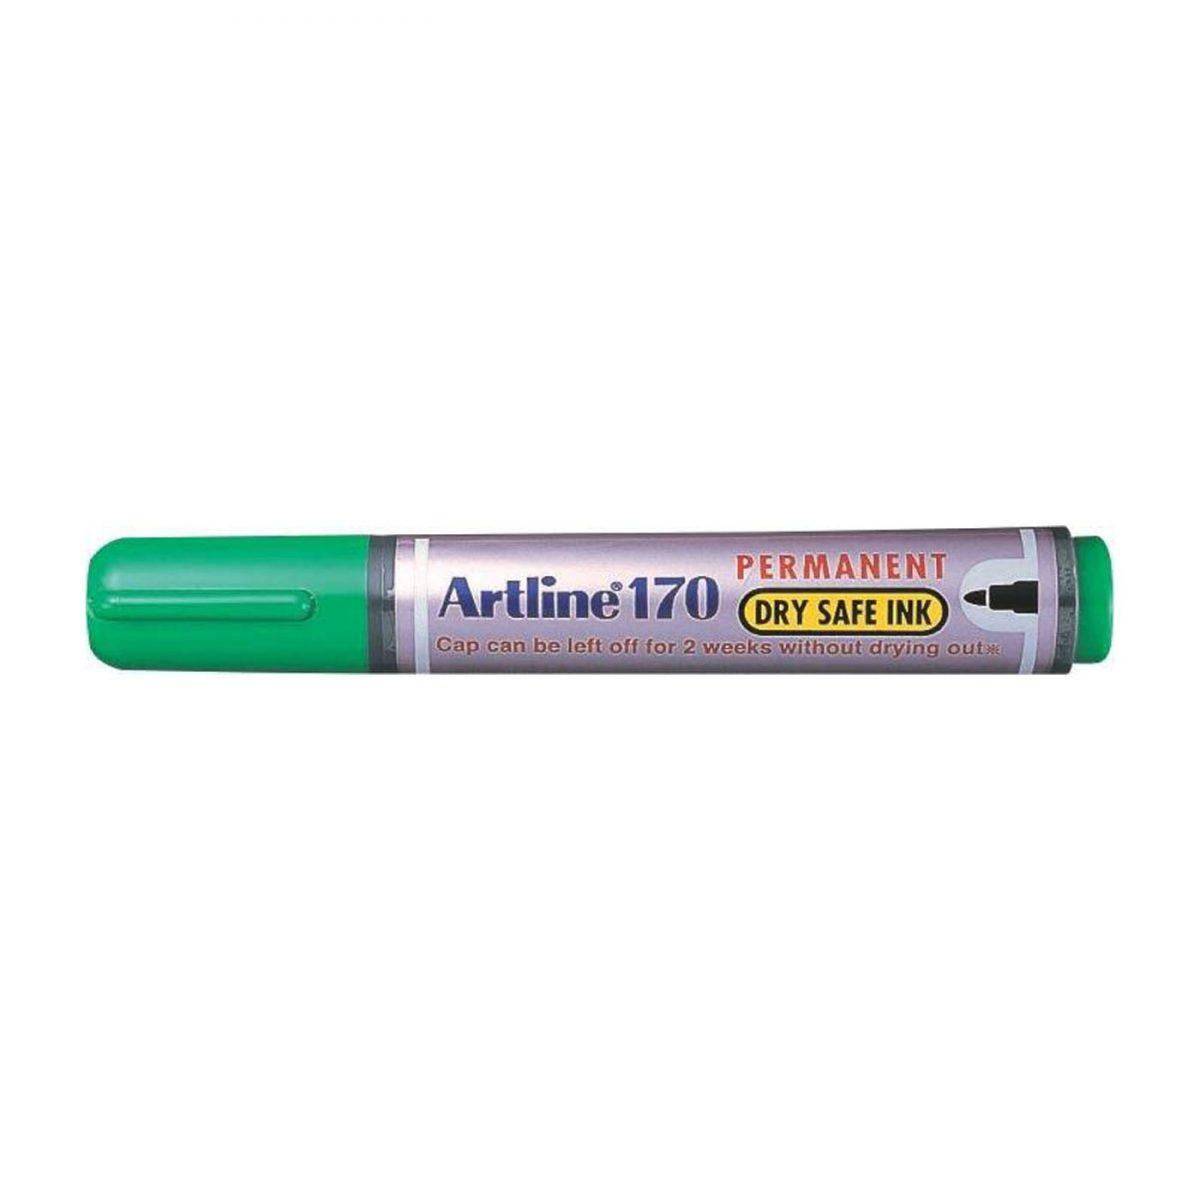 Permanent marker ARTLINE 170 - Dry safe ink, vf. rotund 2.0mm